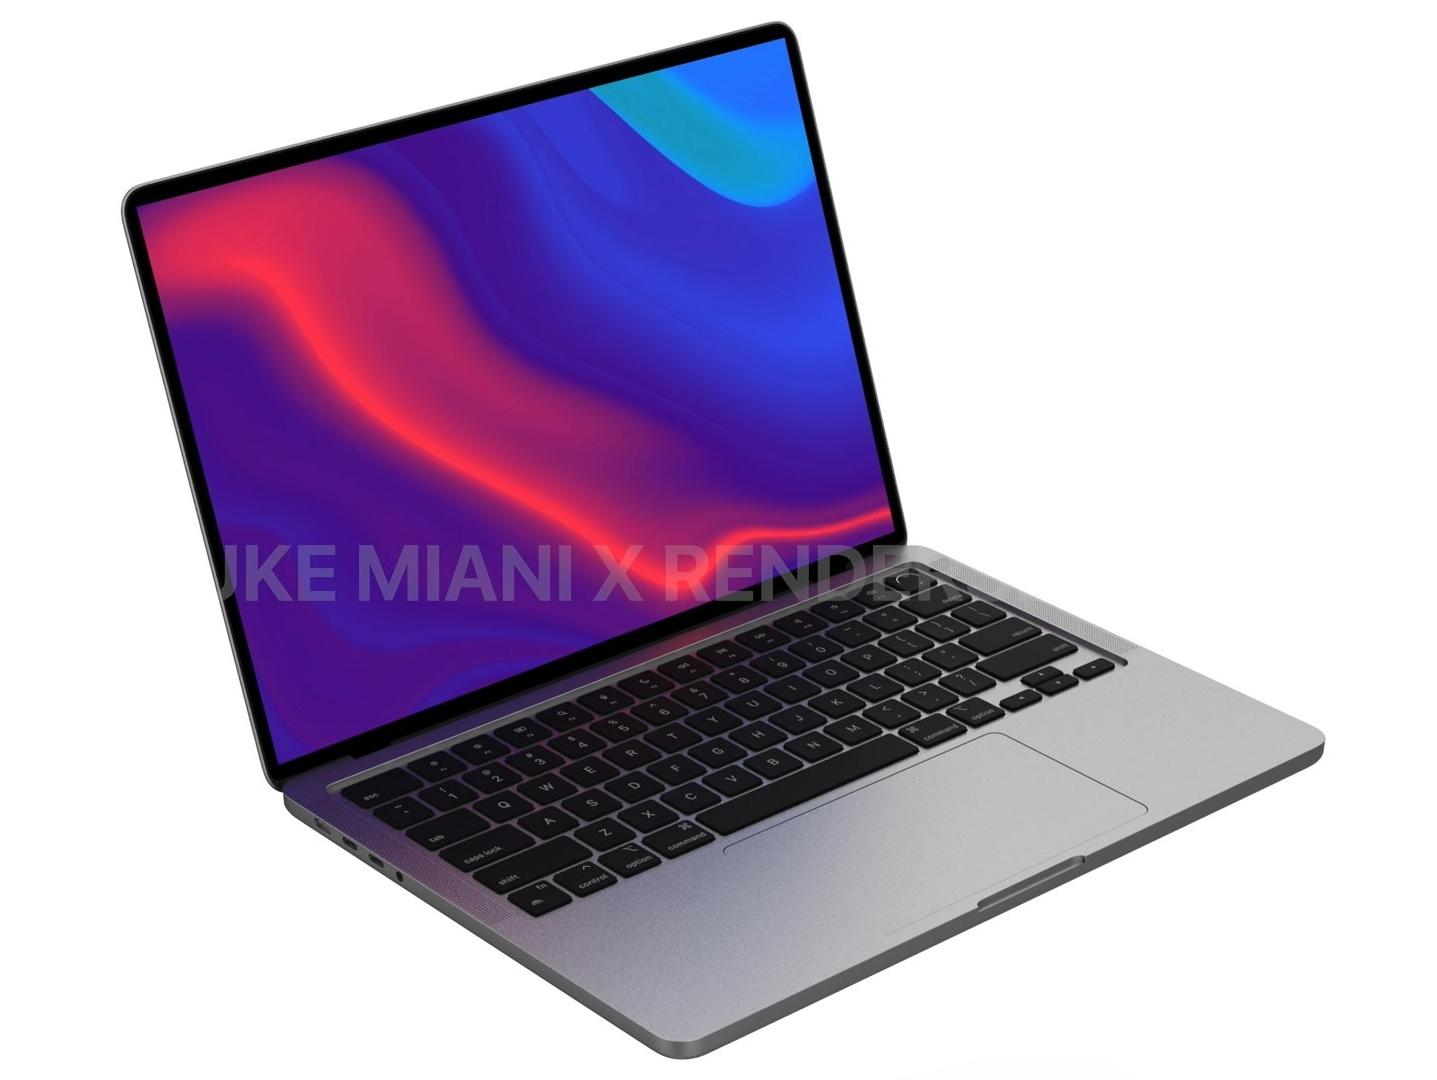 Wwdc 2021 Macbook Pro 14 / Ykiv Xgslguyzm - New macbook ...